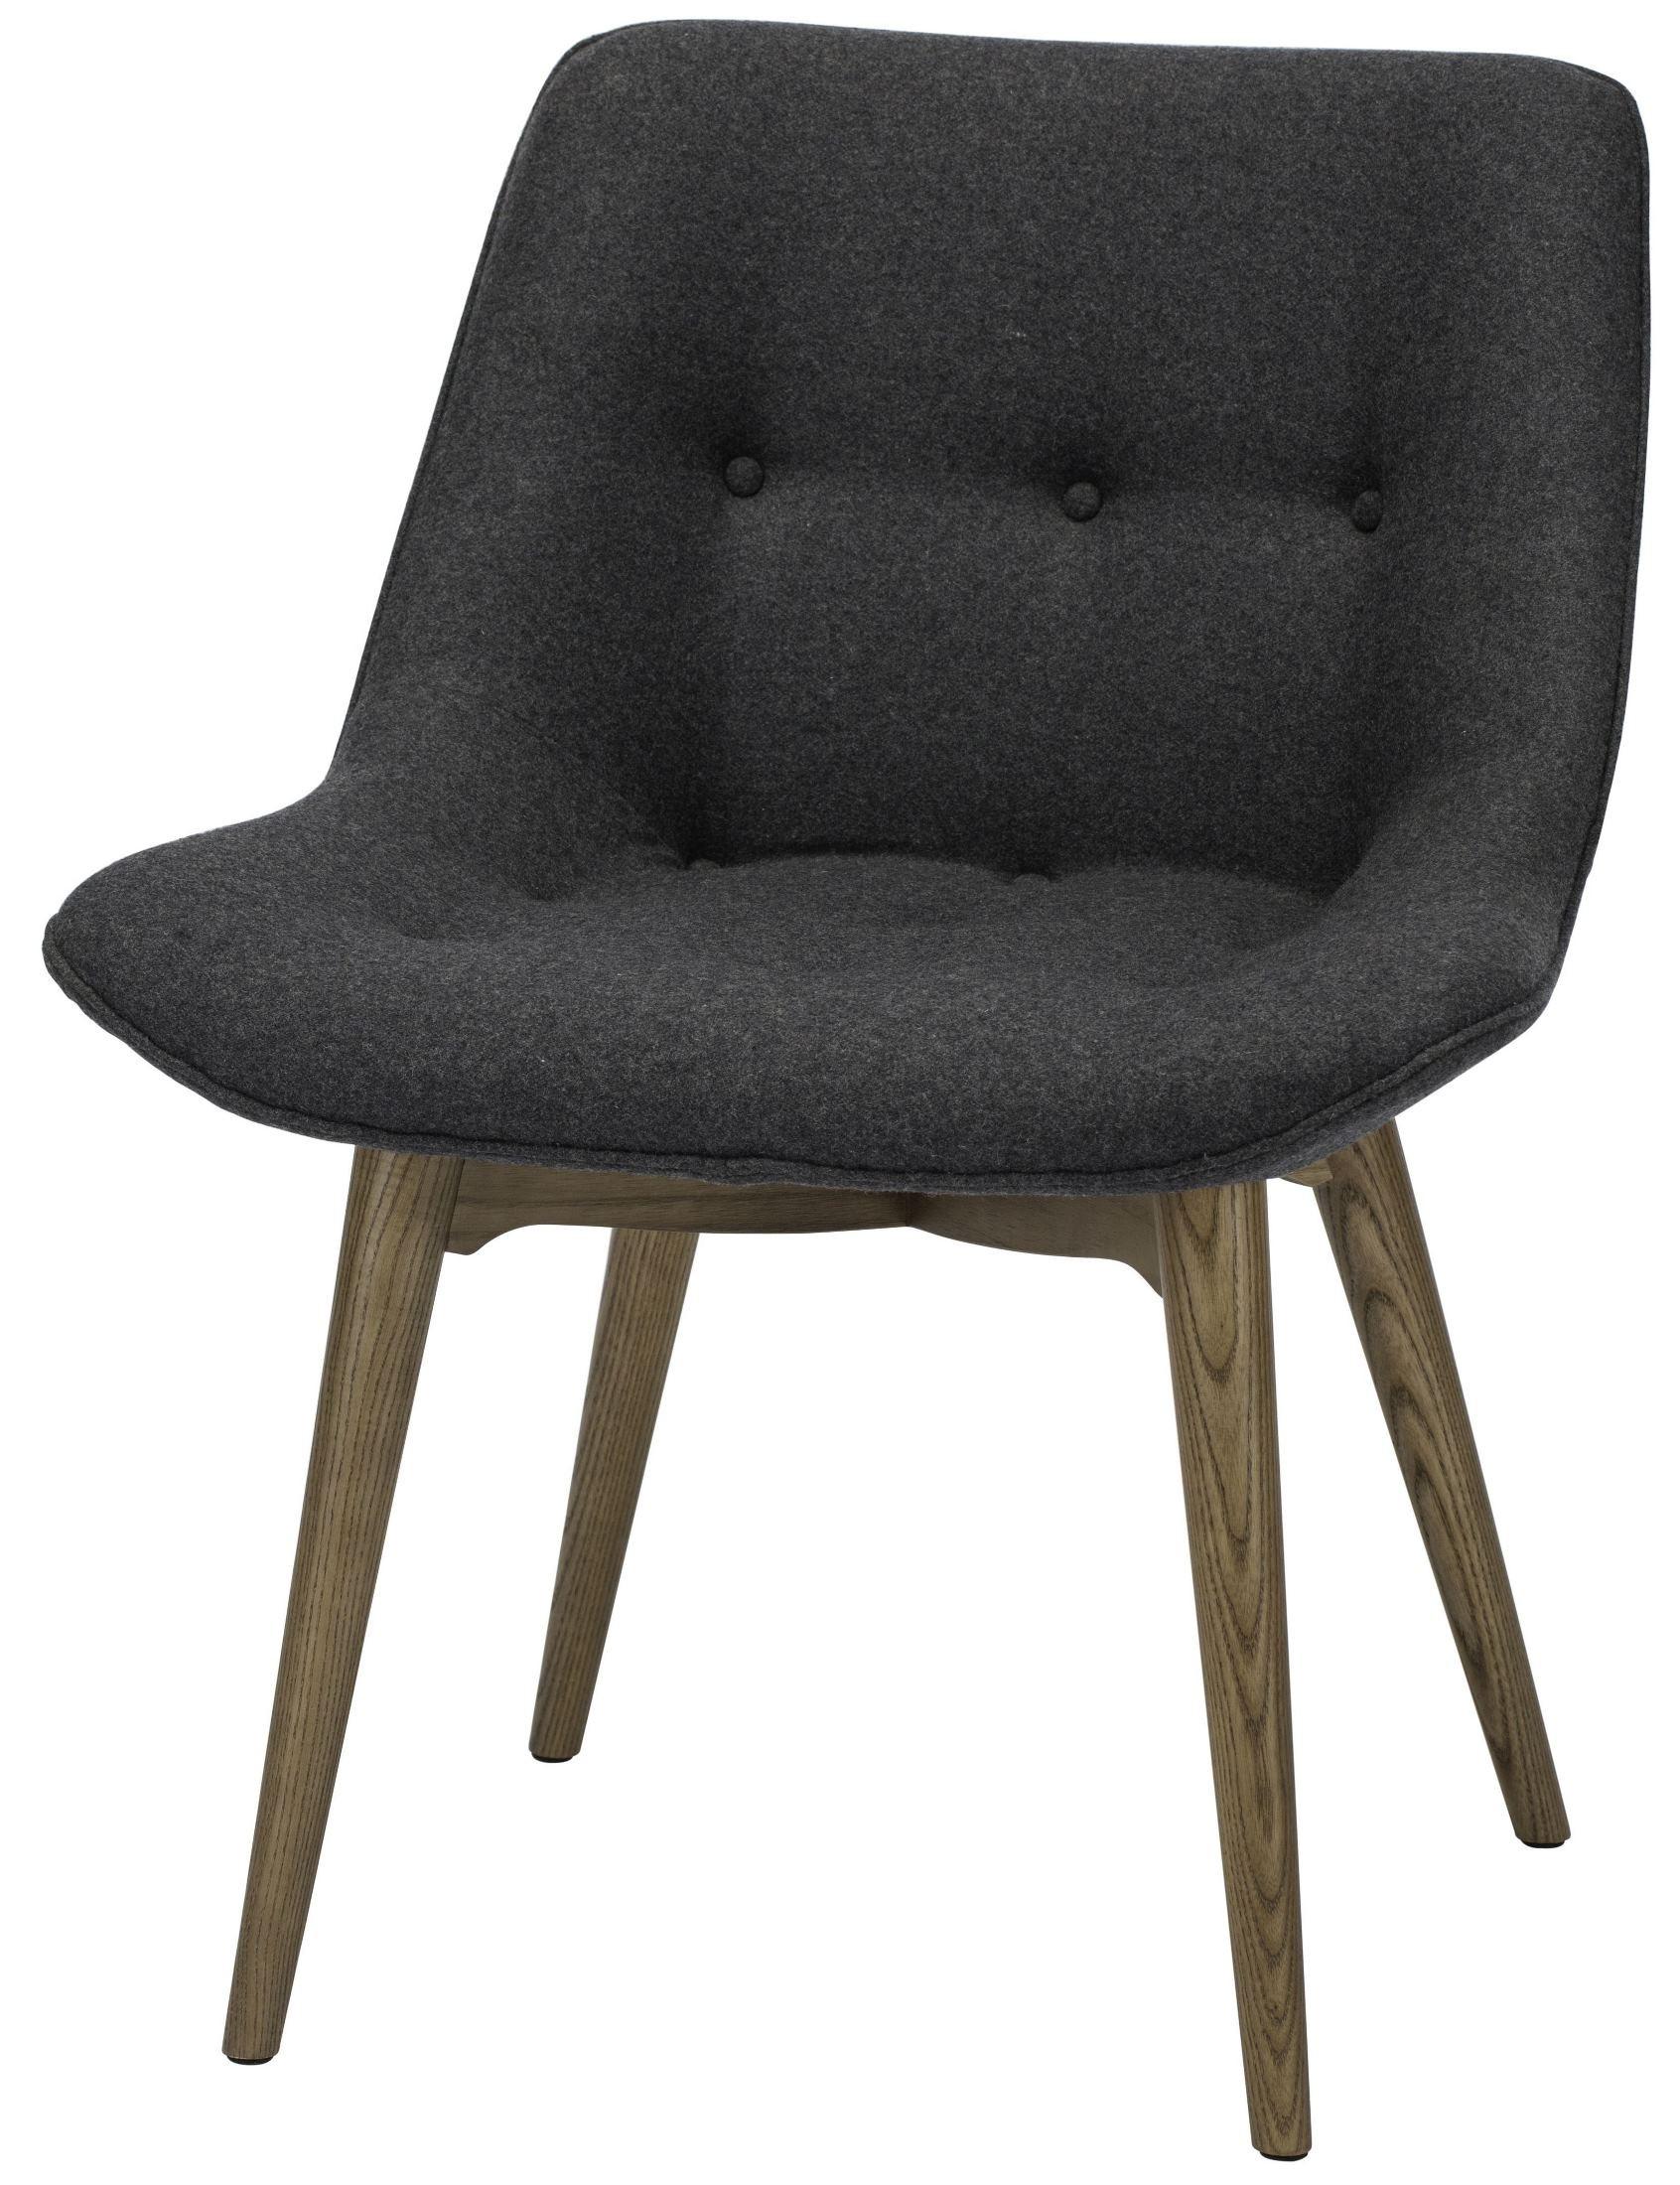 dark gray chair irest massage reviews brie grey fabric dining hgem642 nuevo